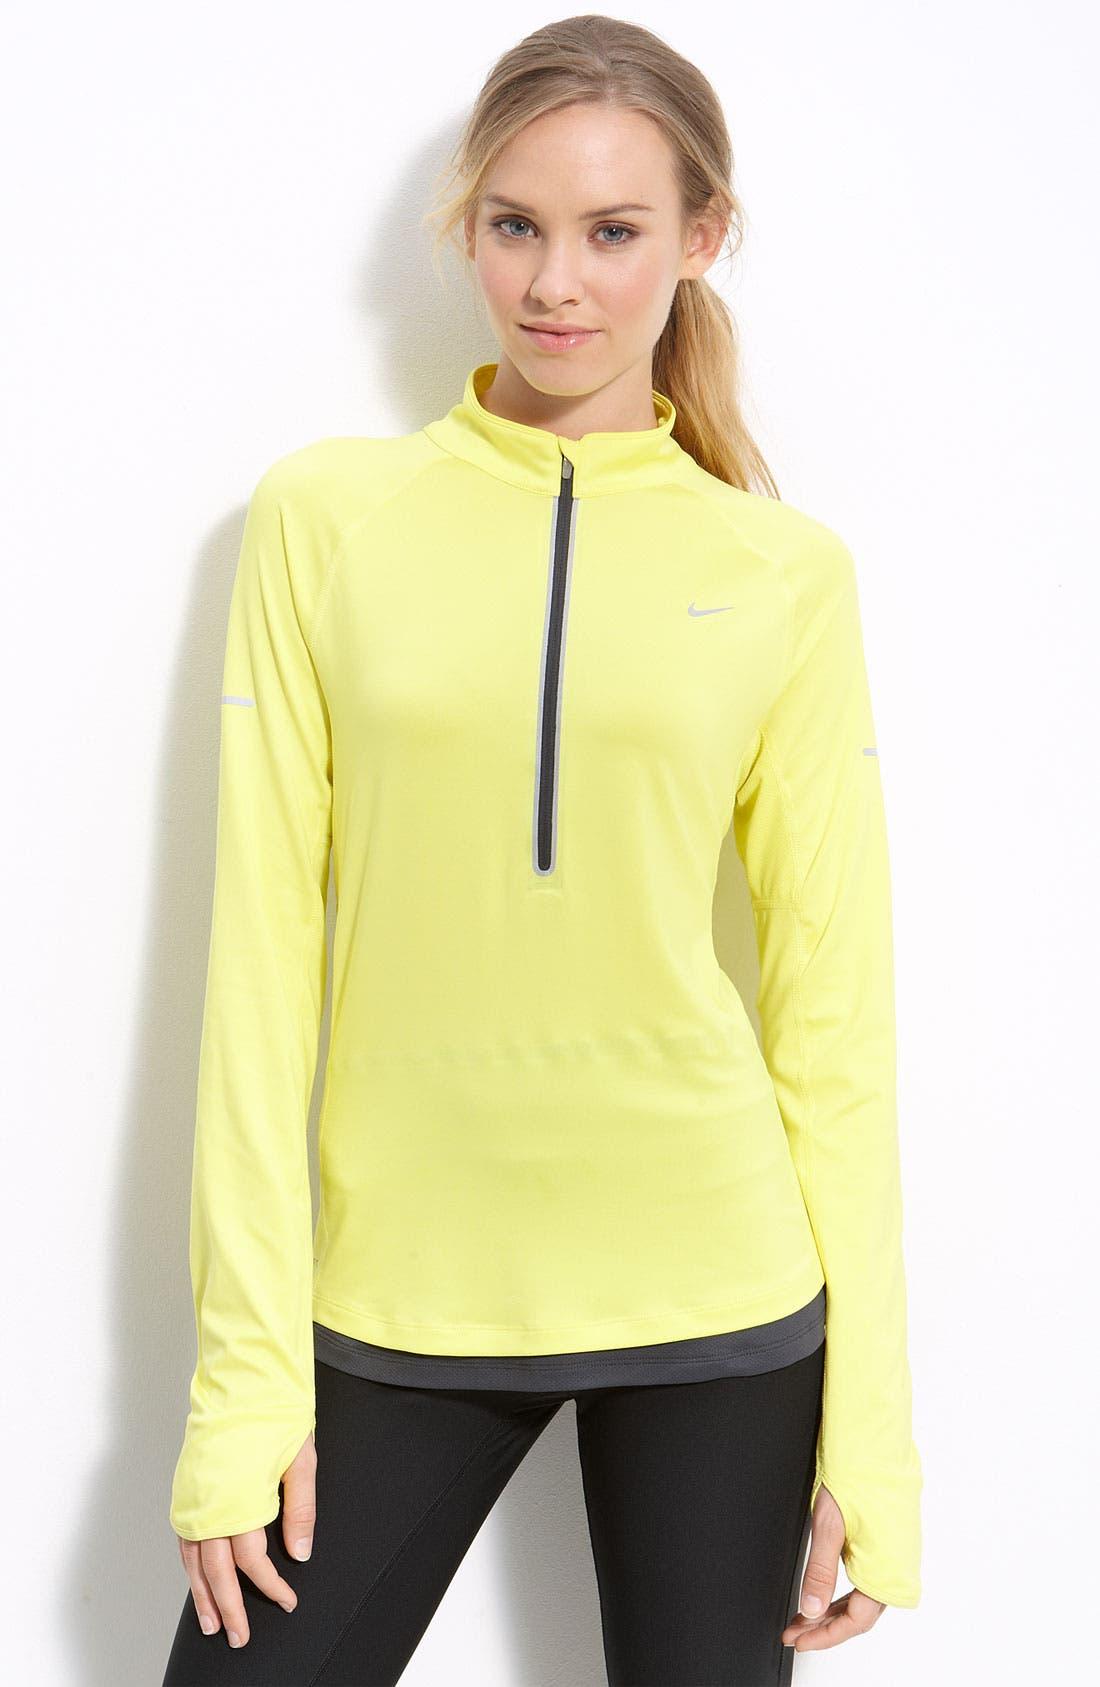 Alternate Image 1 Selected - Nike 'Denier Differential' Half Zip Running Top